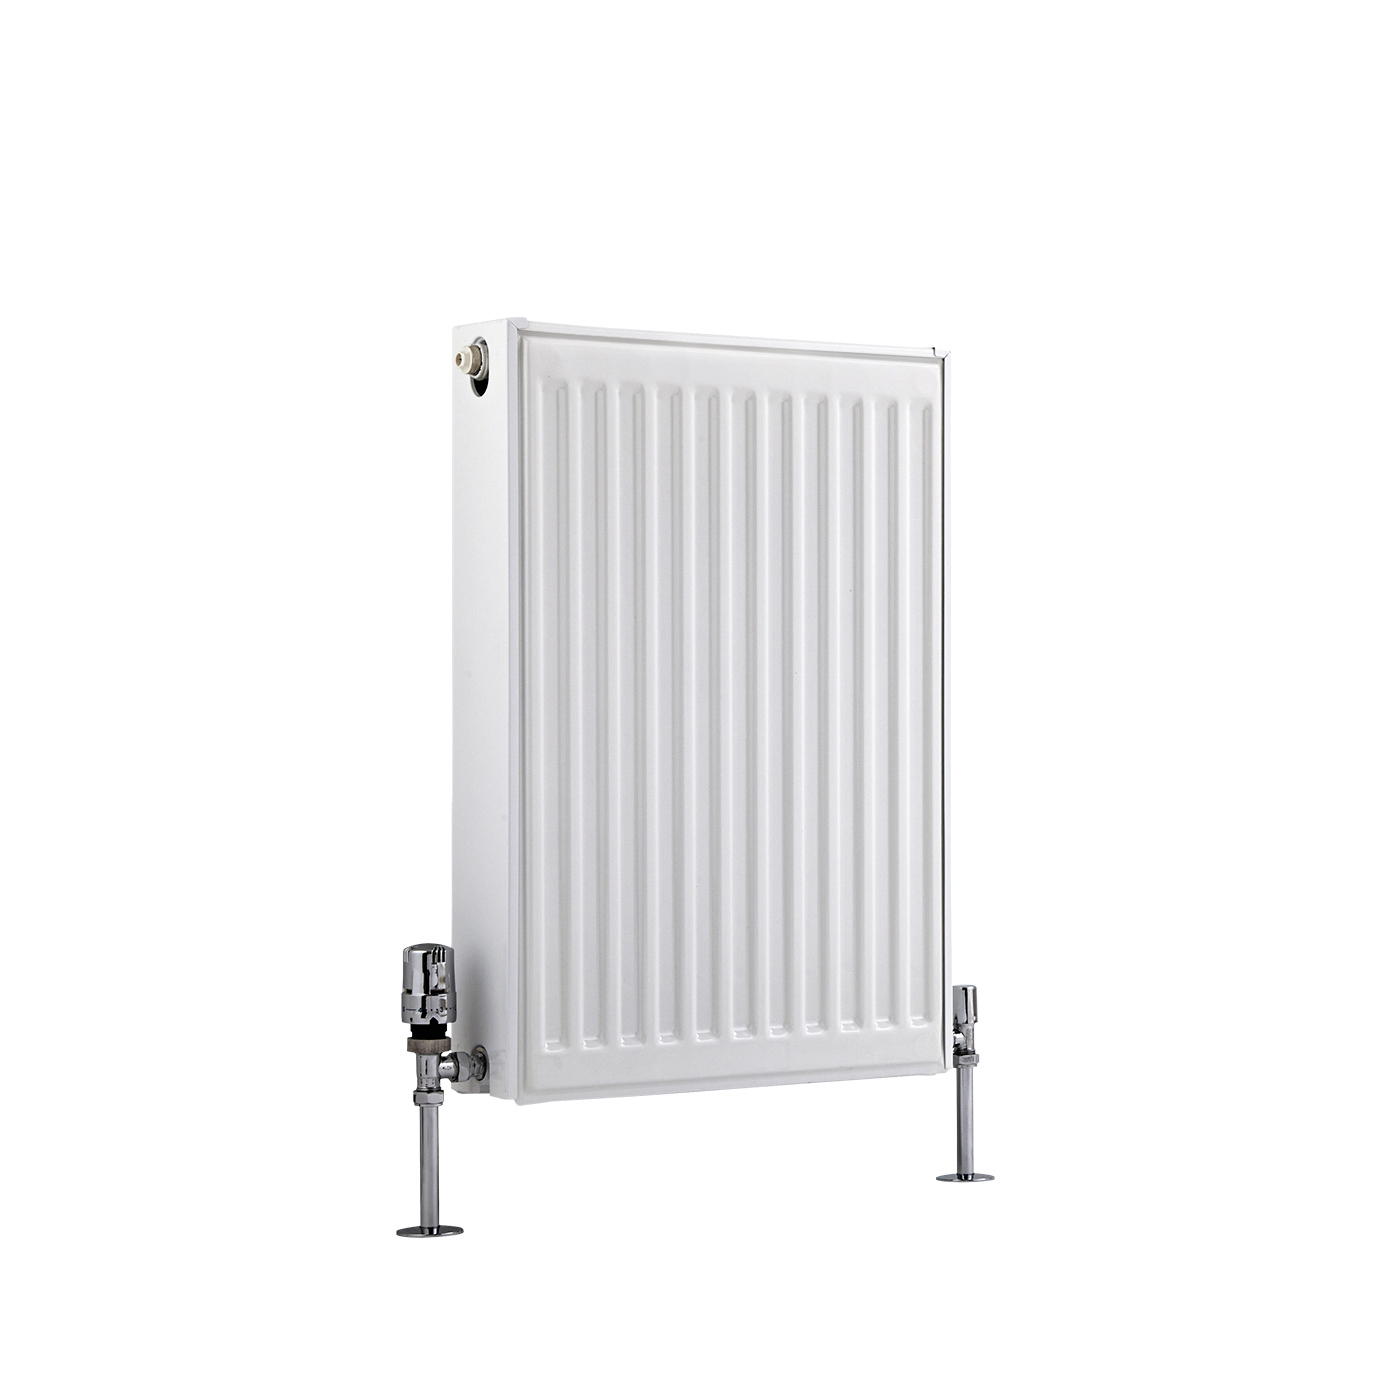 Basic Paneelradiator T 22 Horizontaal Wit 60cm x 40cm x 10,3cm 704 Watt